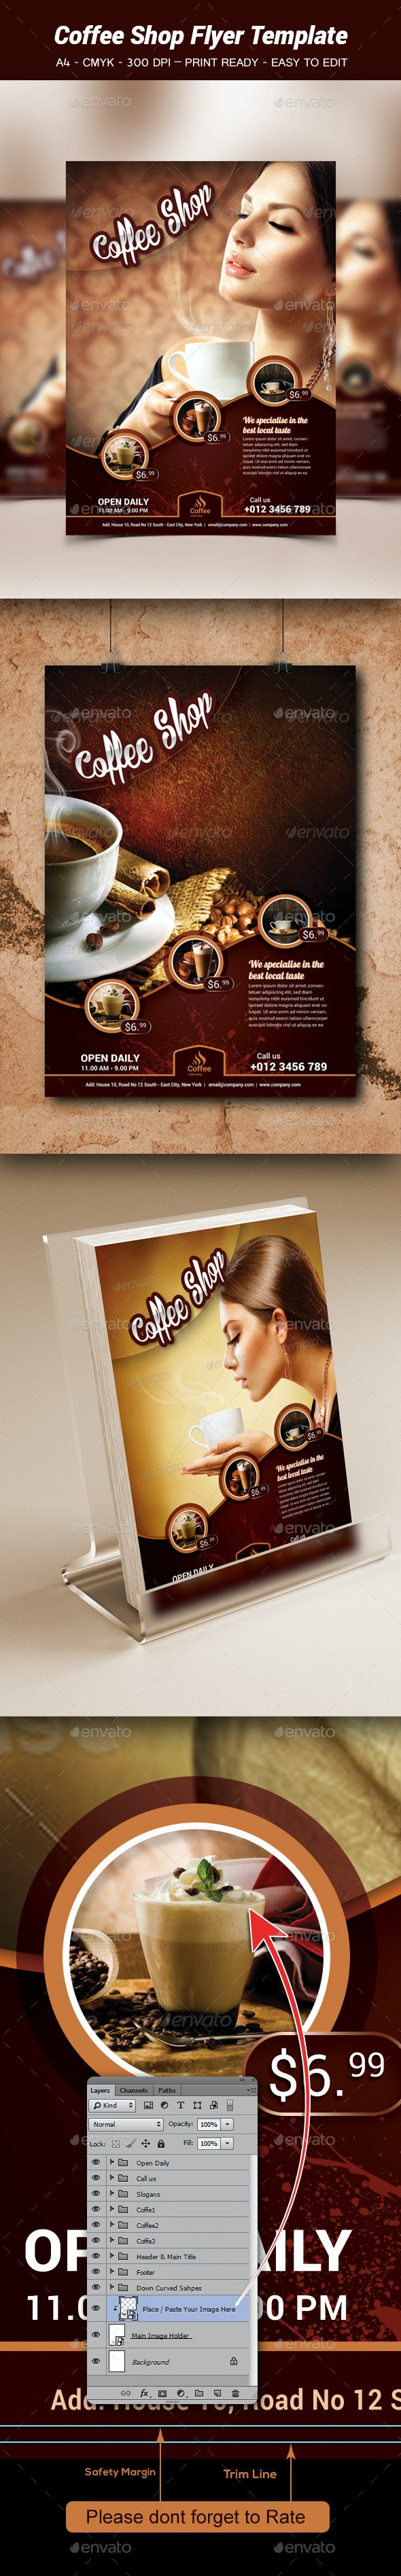 Coffe Shop Flyer Template - Flyers Print Templates